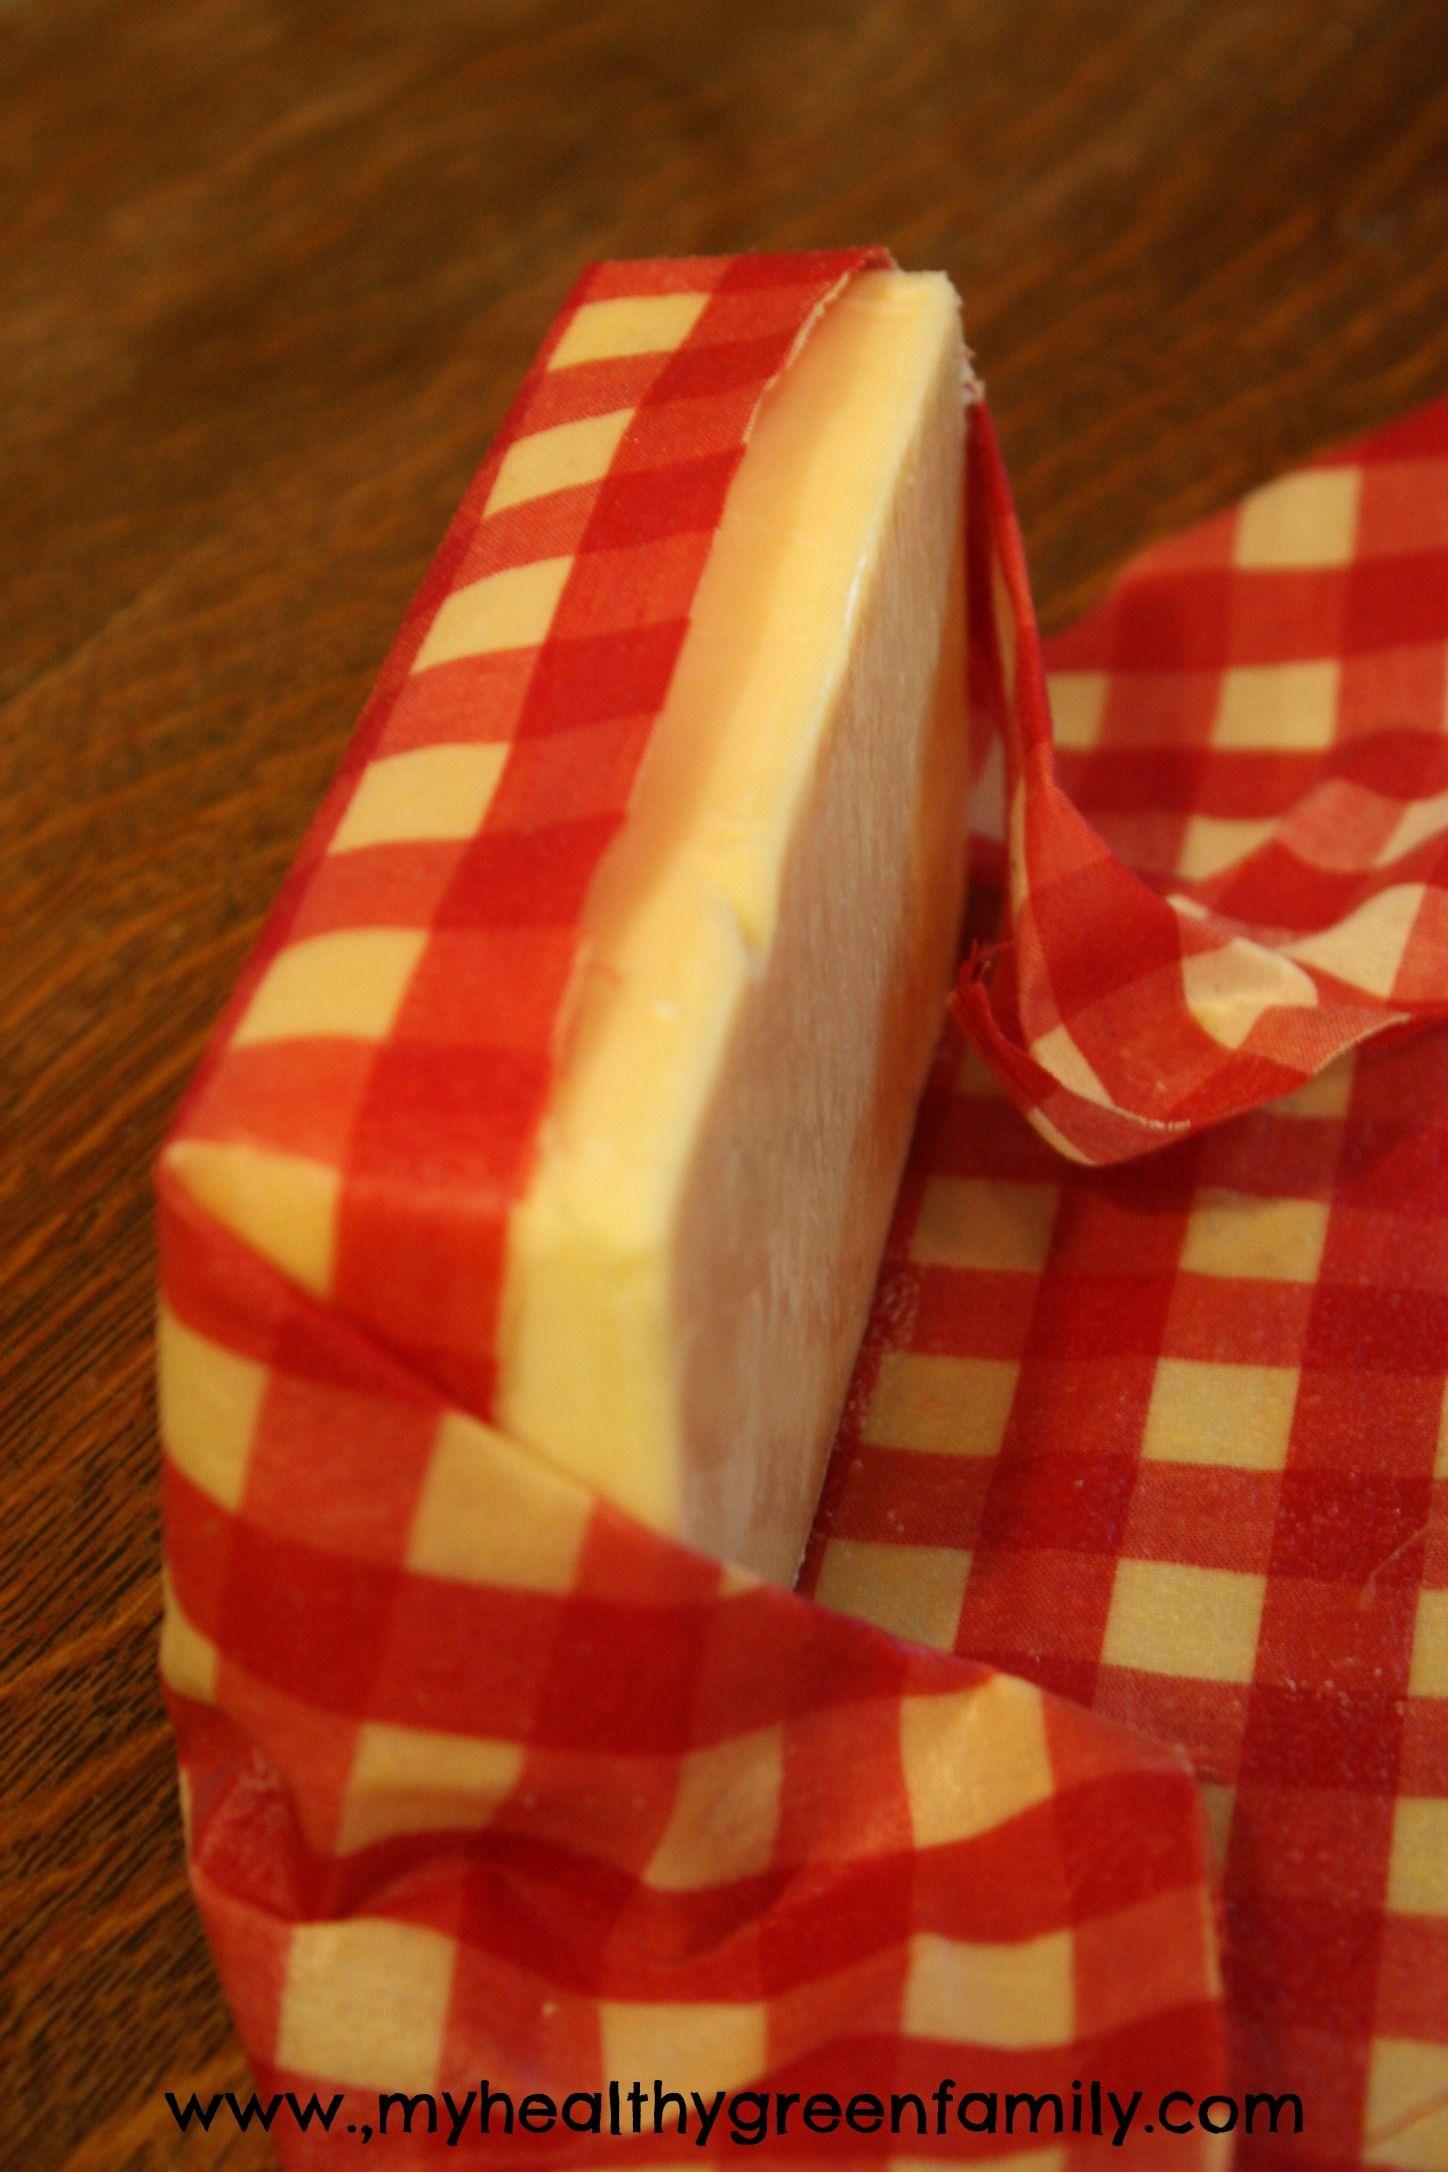 Plastic Wrap Alternative Diy Beeswax Cotton Wraps This